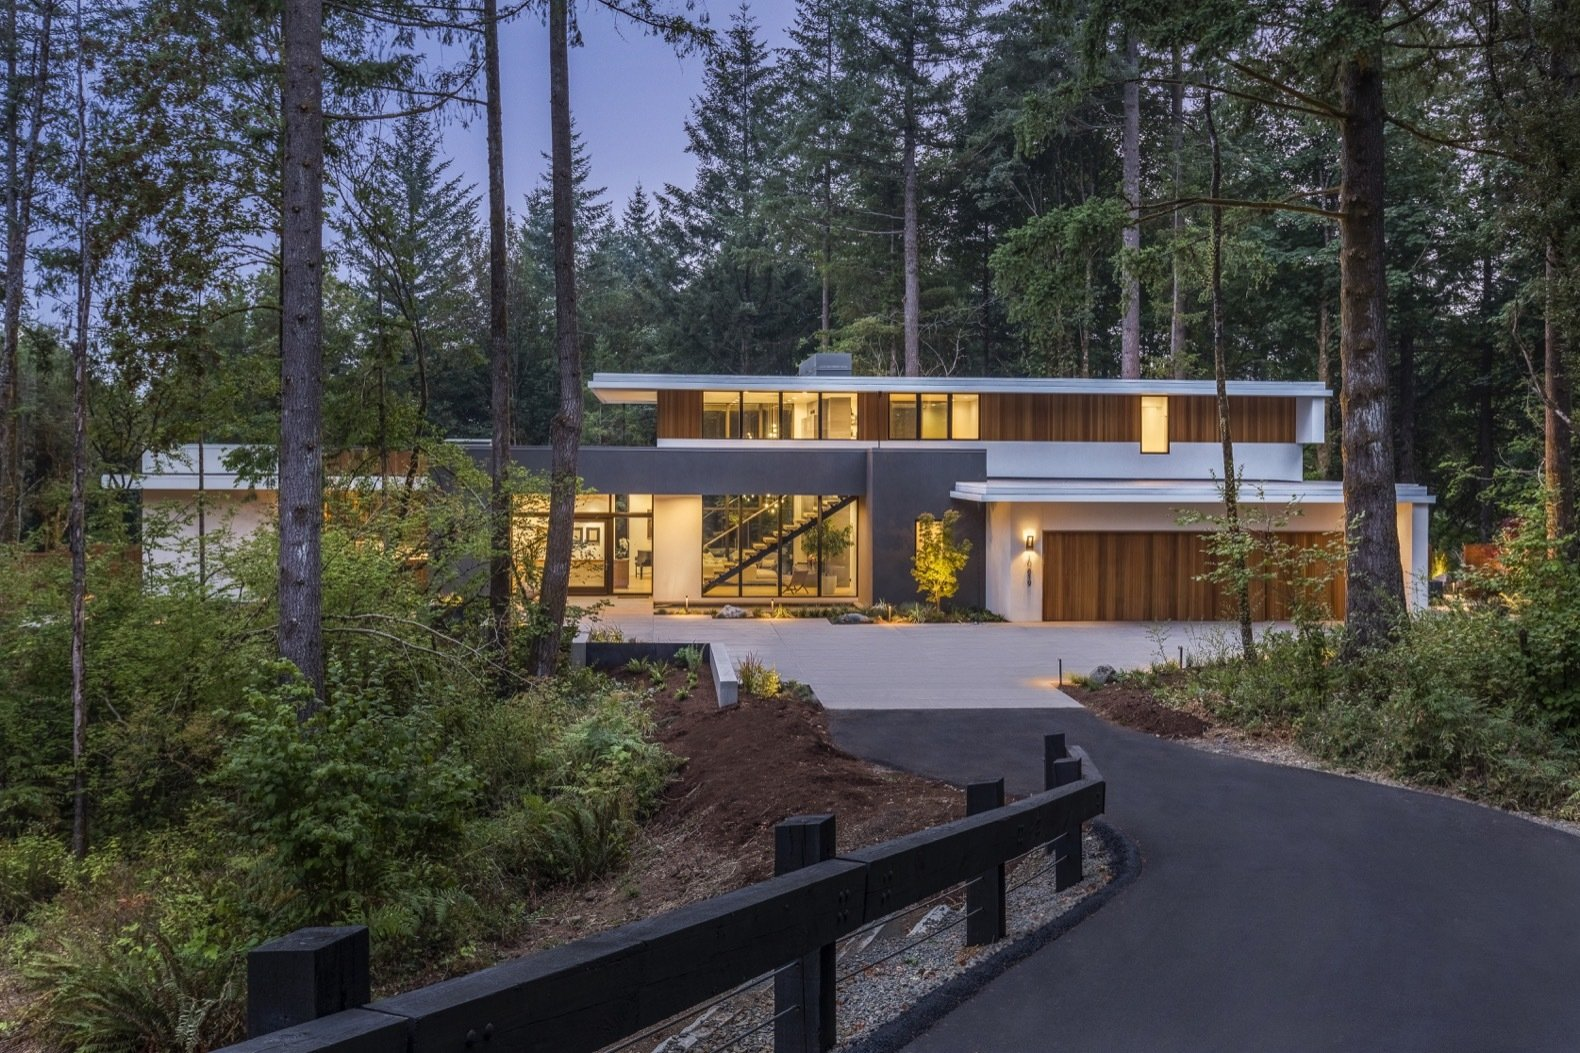 Wildwood House by Giulietti Schouten Architects